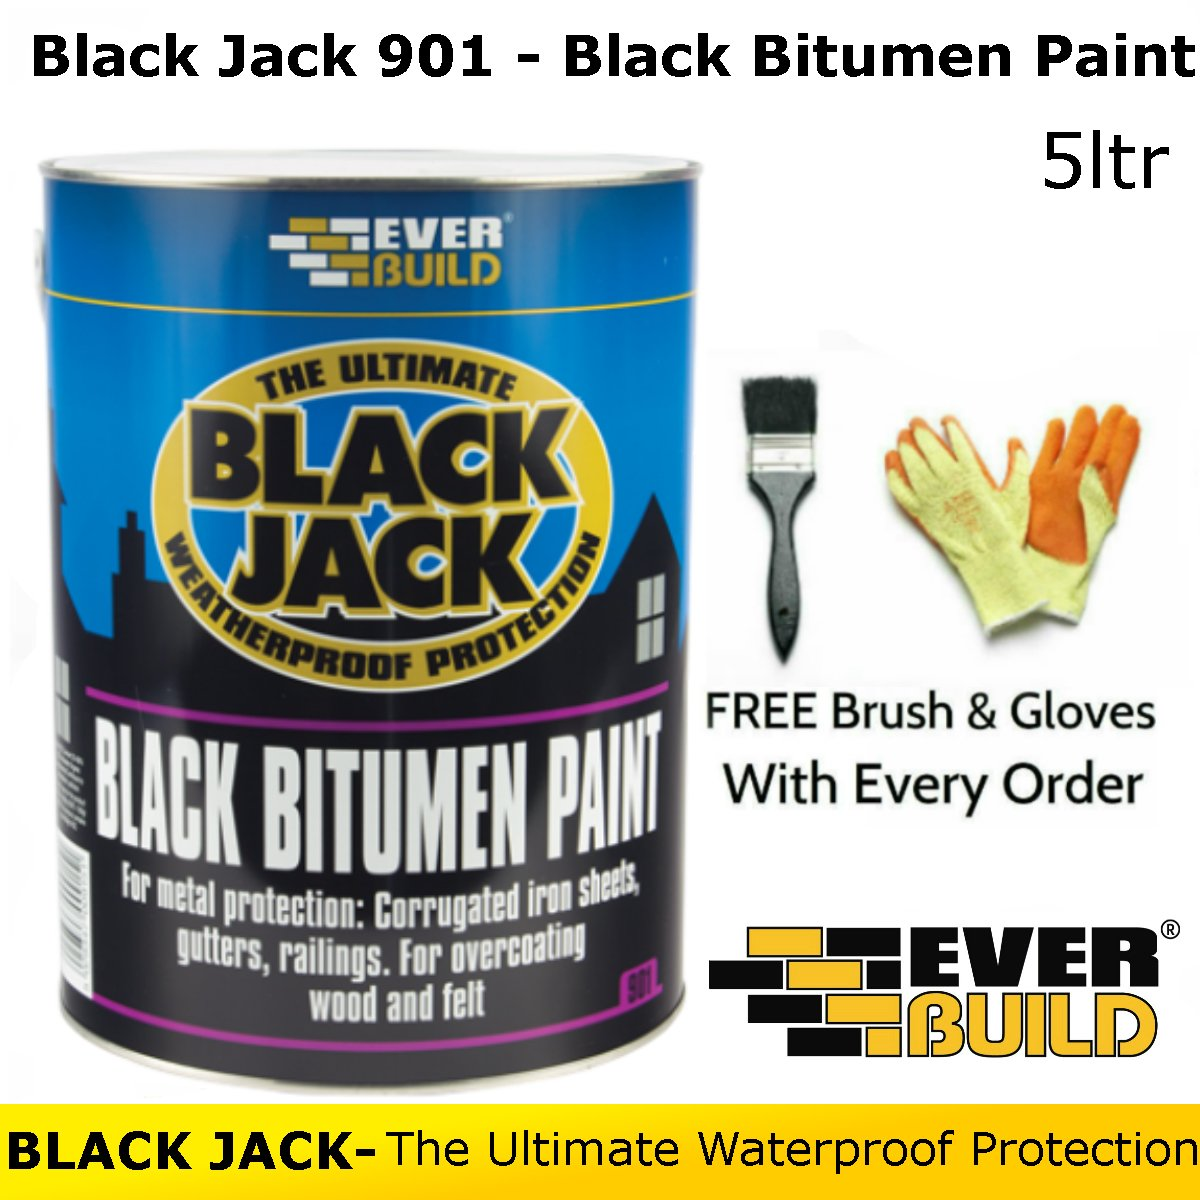 Black Jack 901 | Black Bitumen Paint | By Everbuild | FREE Brush and Gloves | 5 Litres